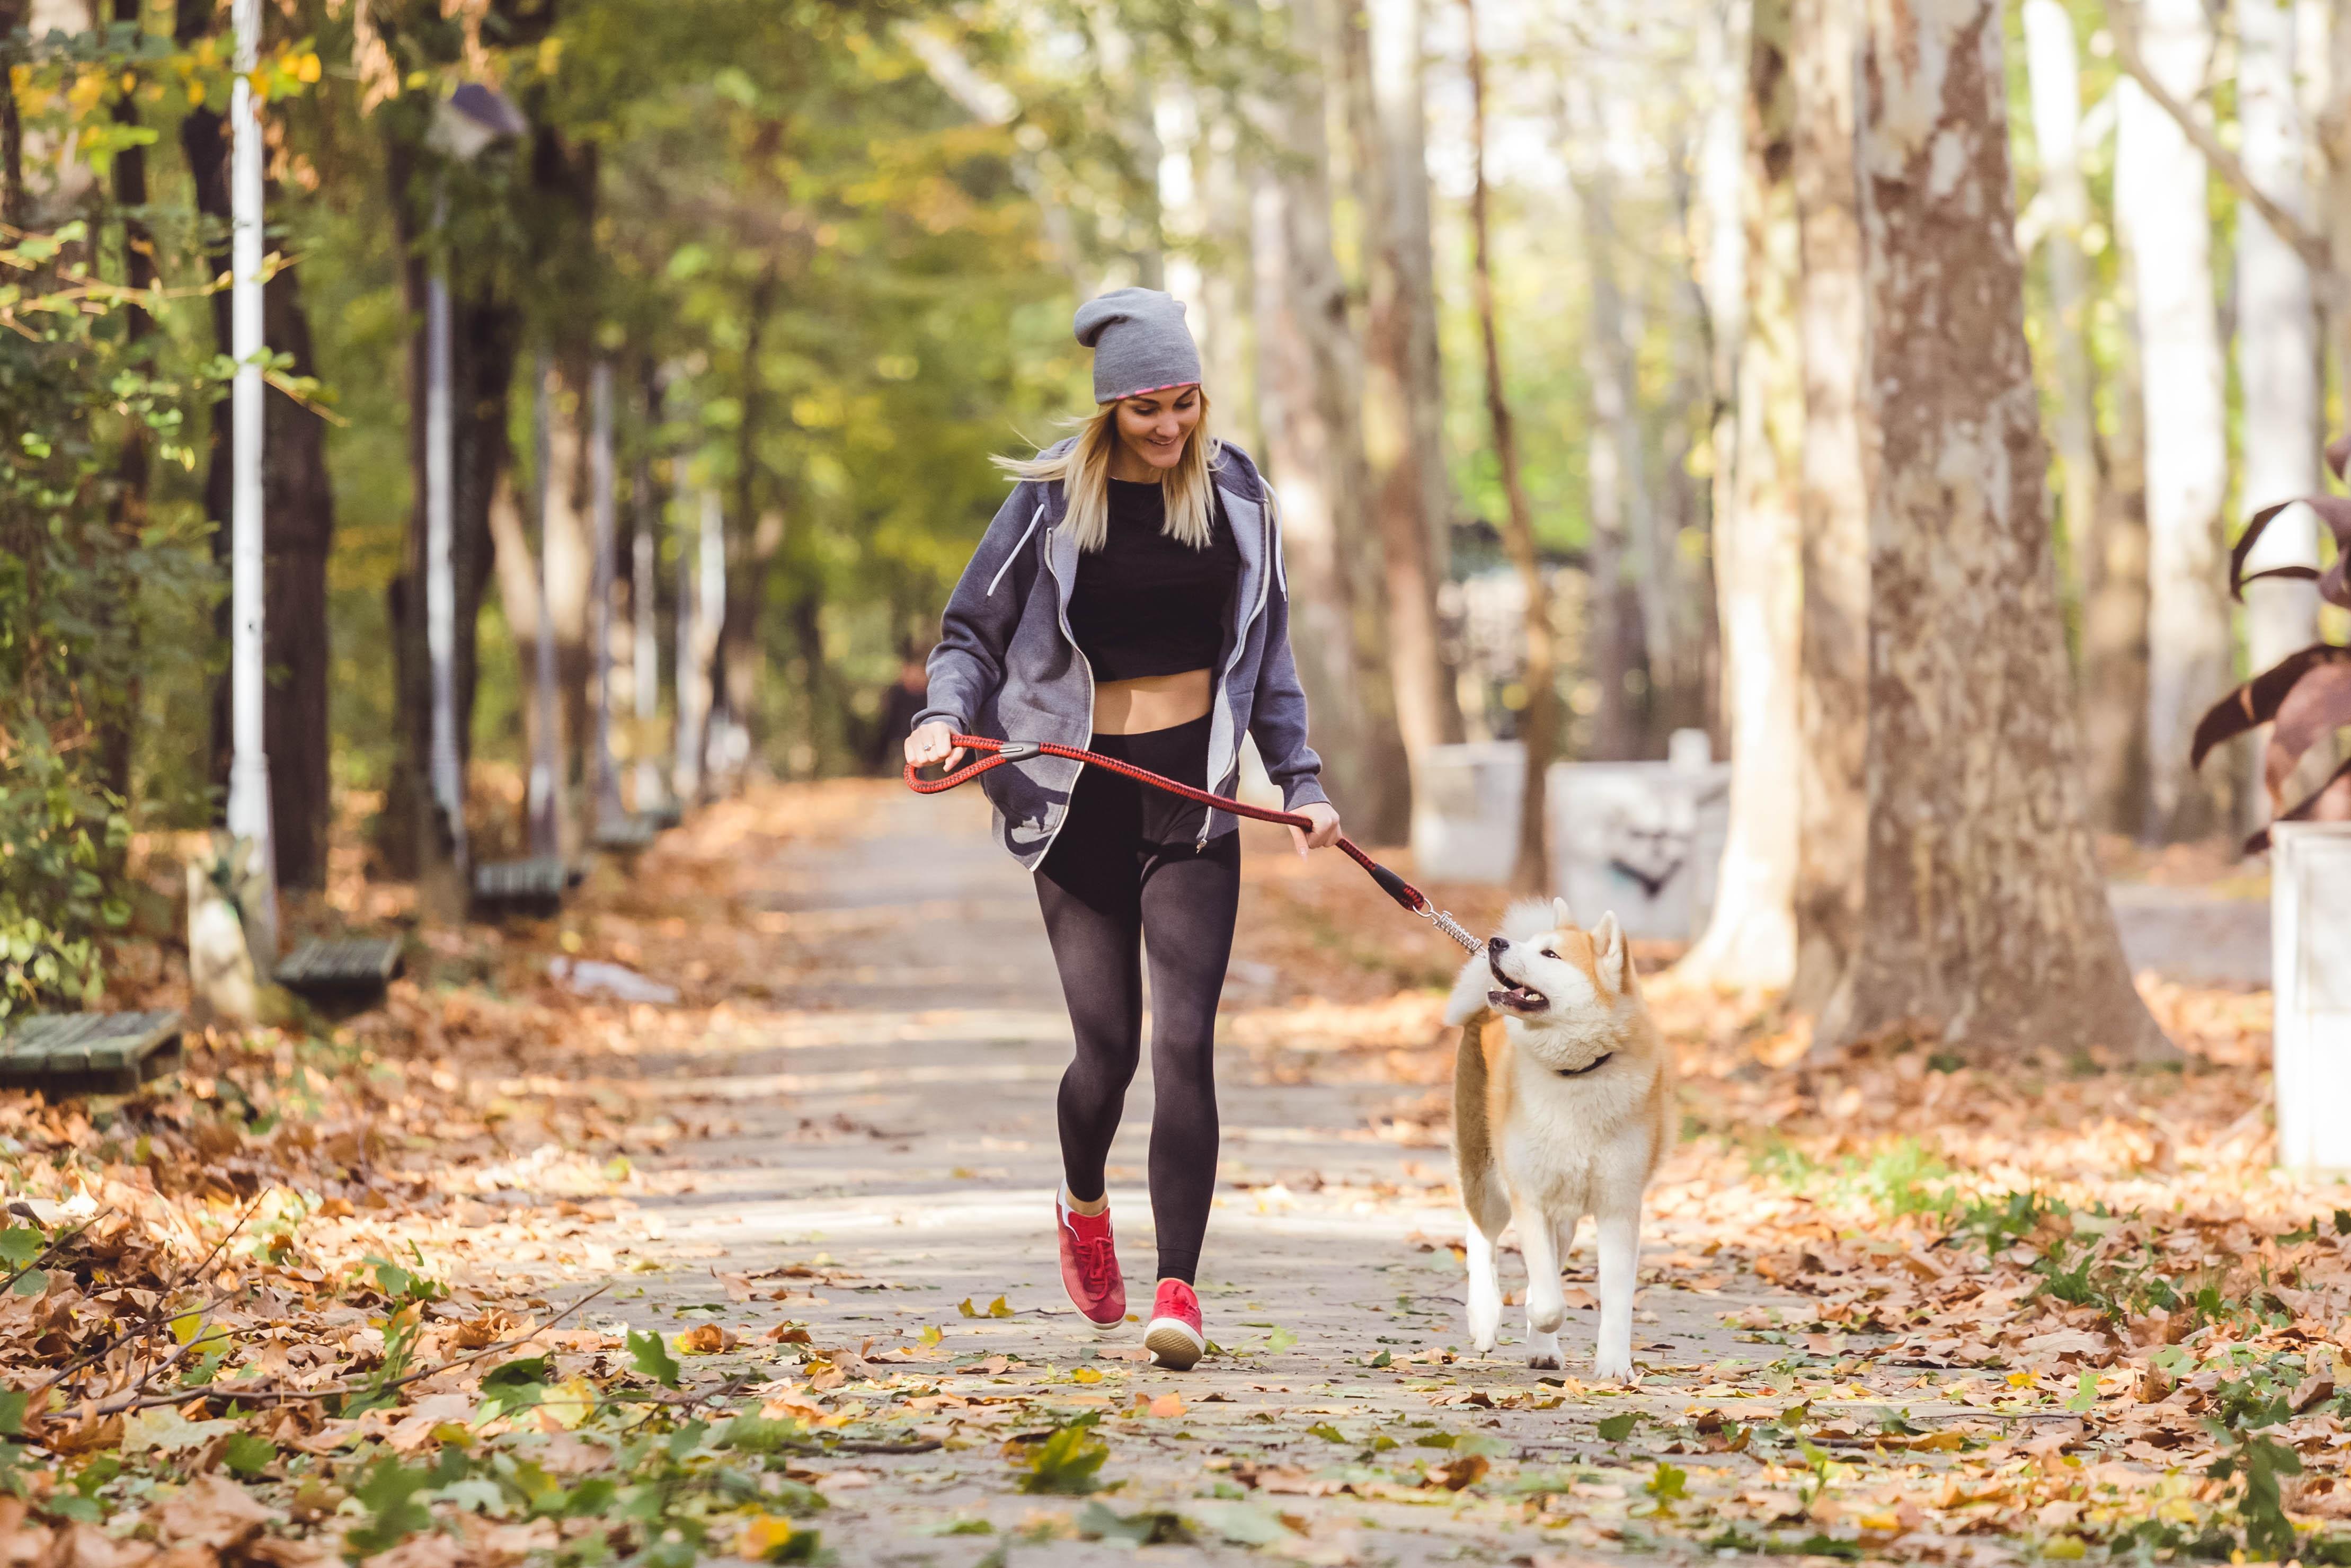 pretty-blonde-woman-walking-dog-in-park | study in Canada